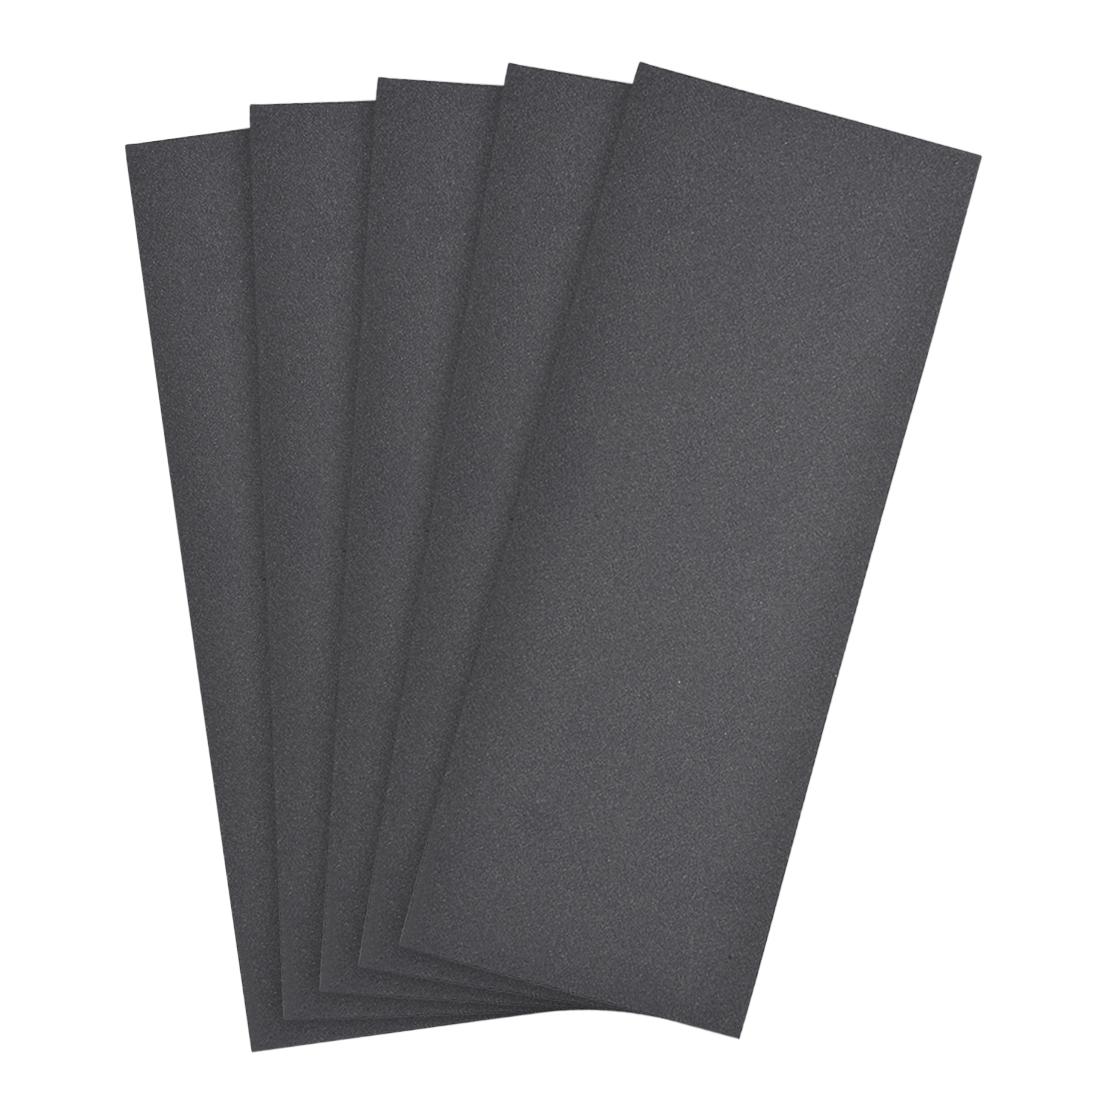 Waterproof Sandpaper, Wet Dry Sand Paper Grit of 500, 9 x 3.7inch 5pcs